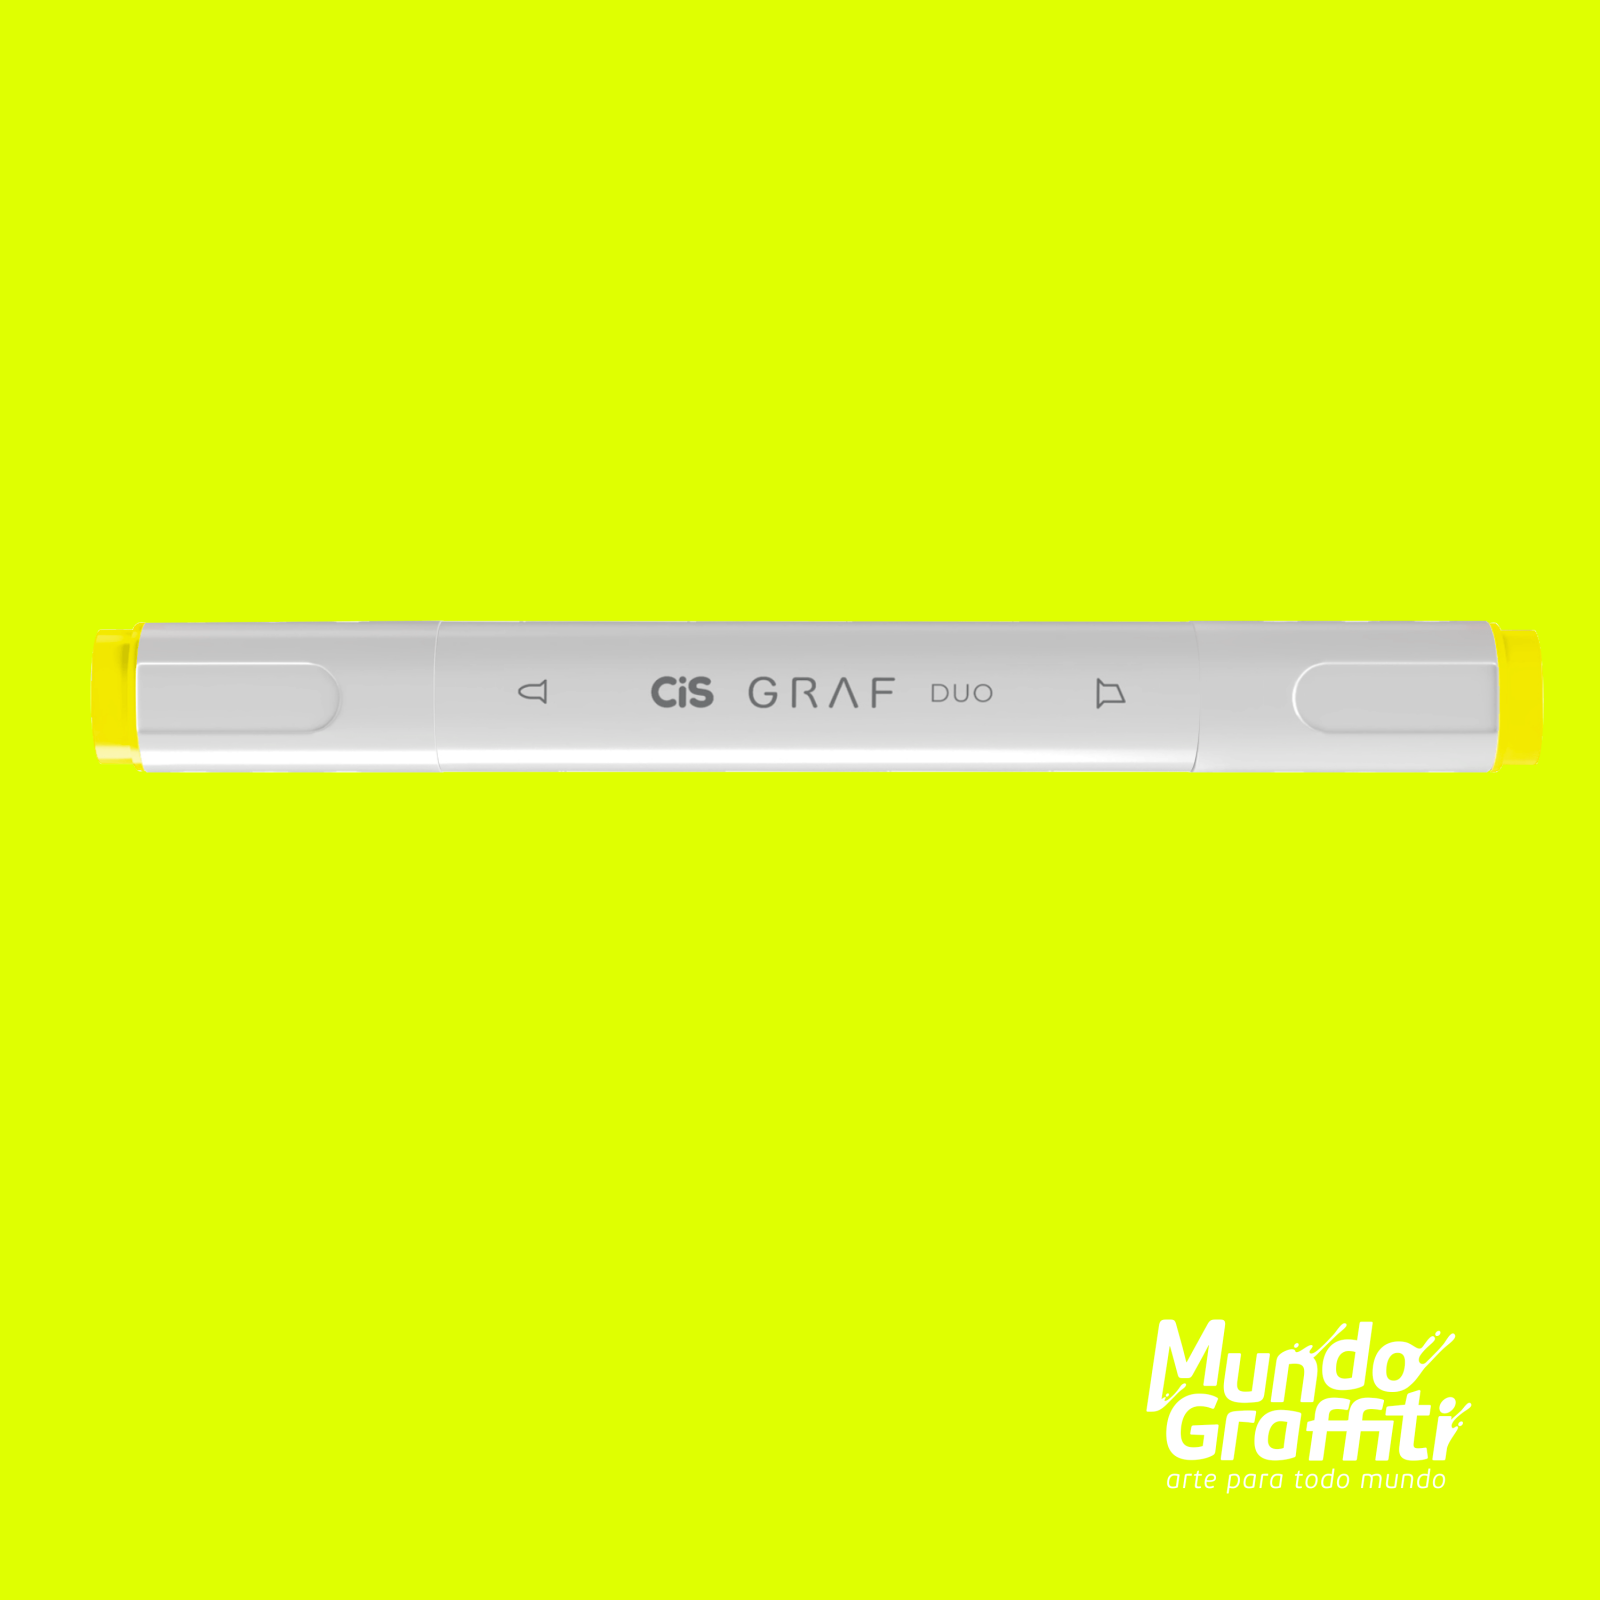 Marcador Cis Graf Duo Fluorescent Yellow 123 - Mundo Graffiti